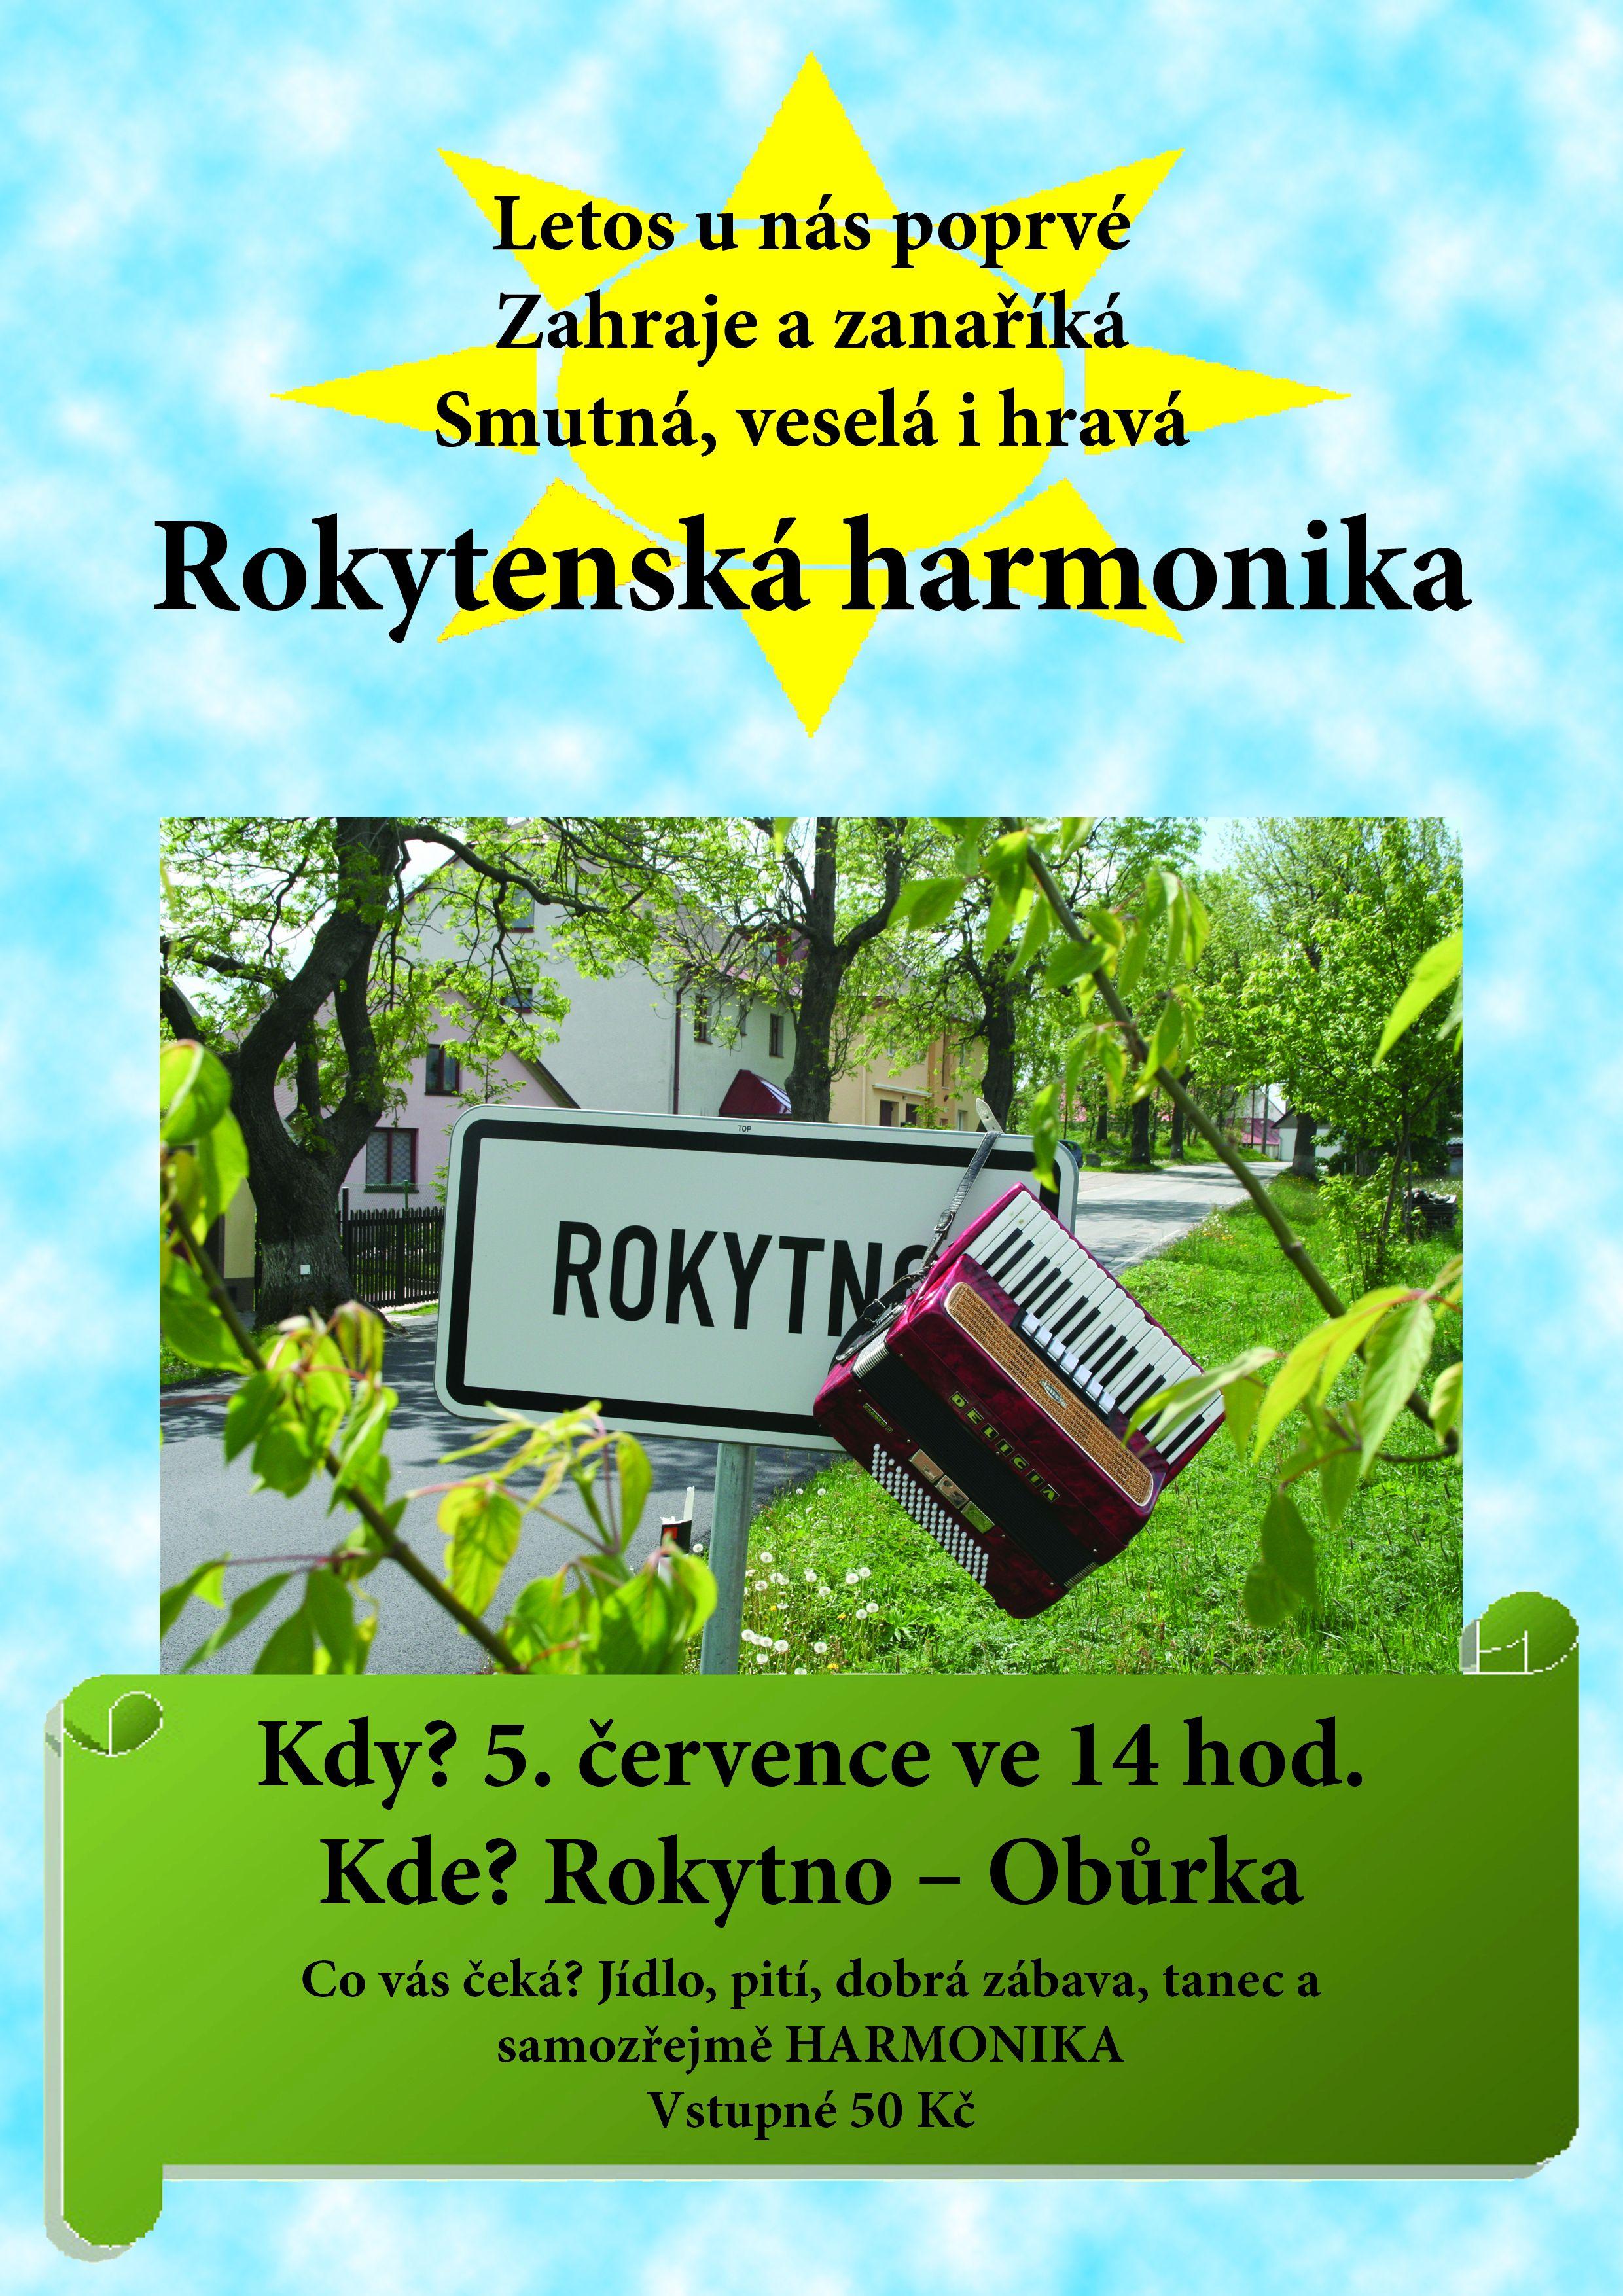 Aktuality - Rokytenská harmonika